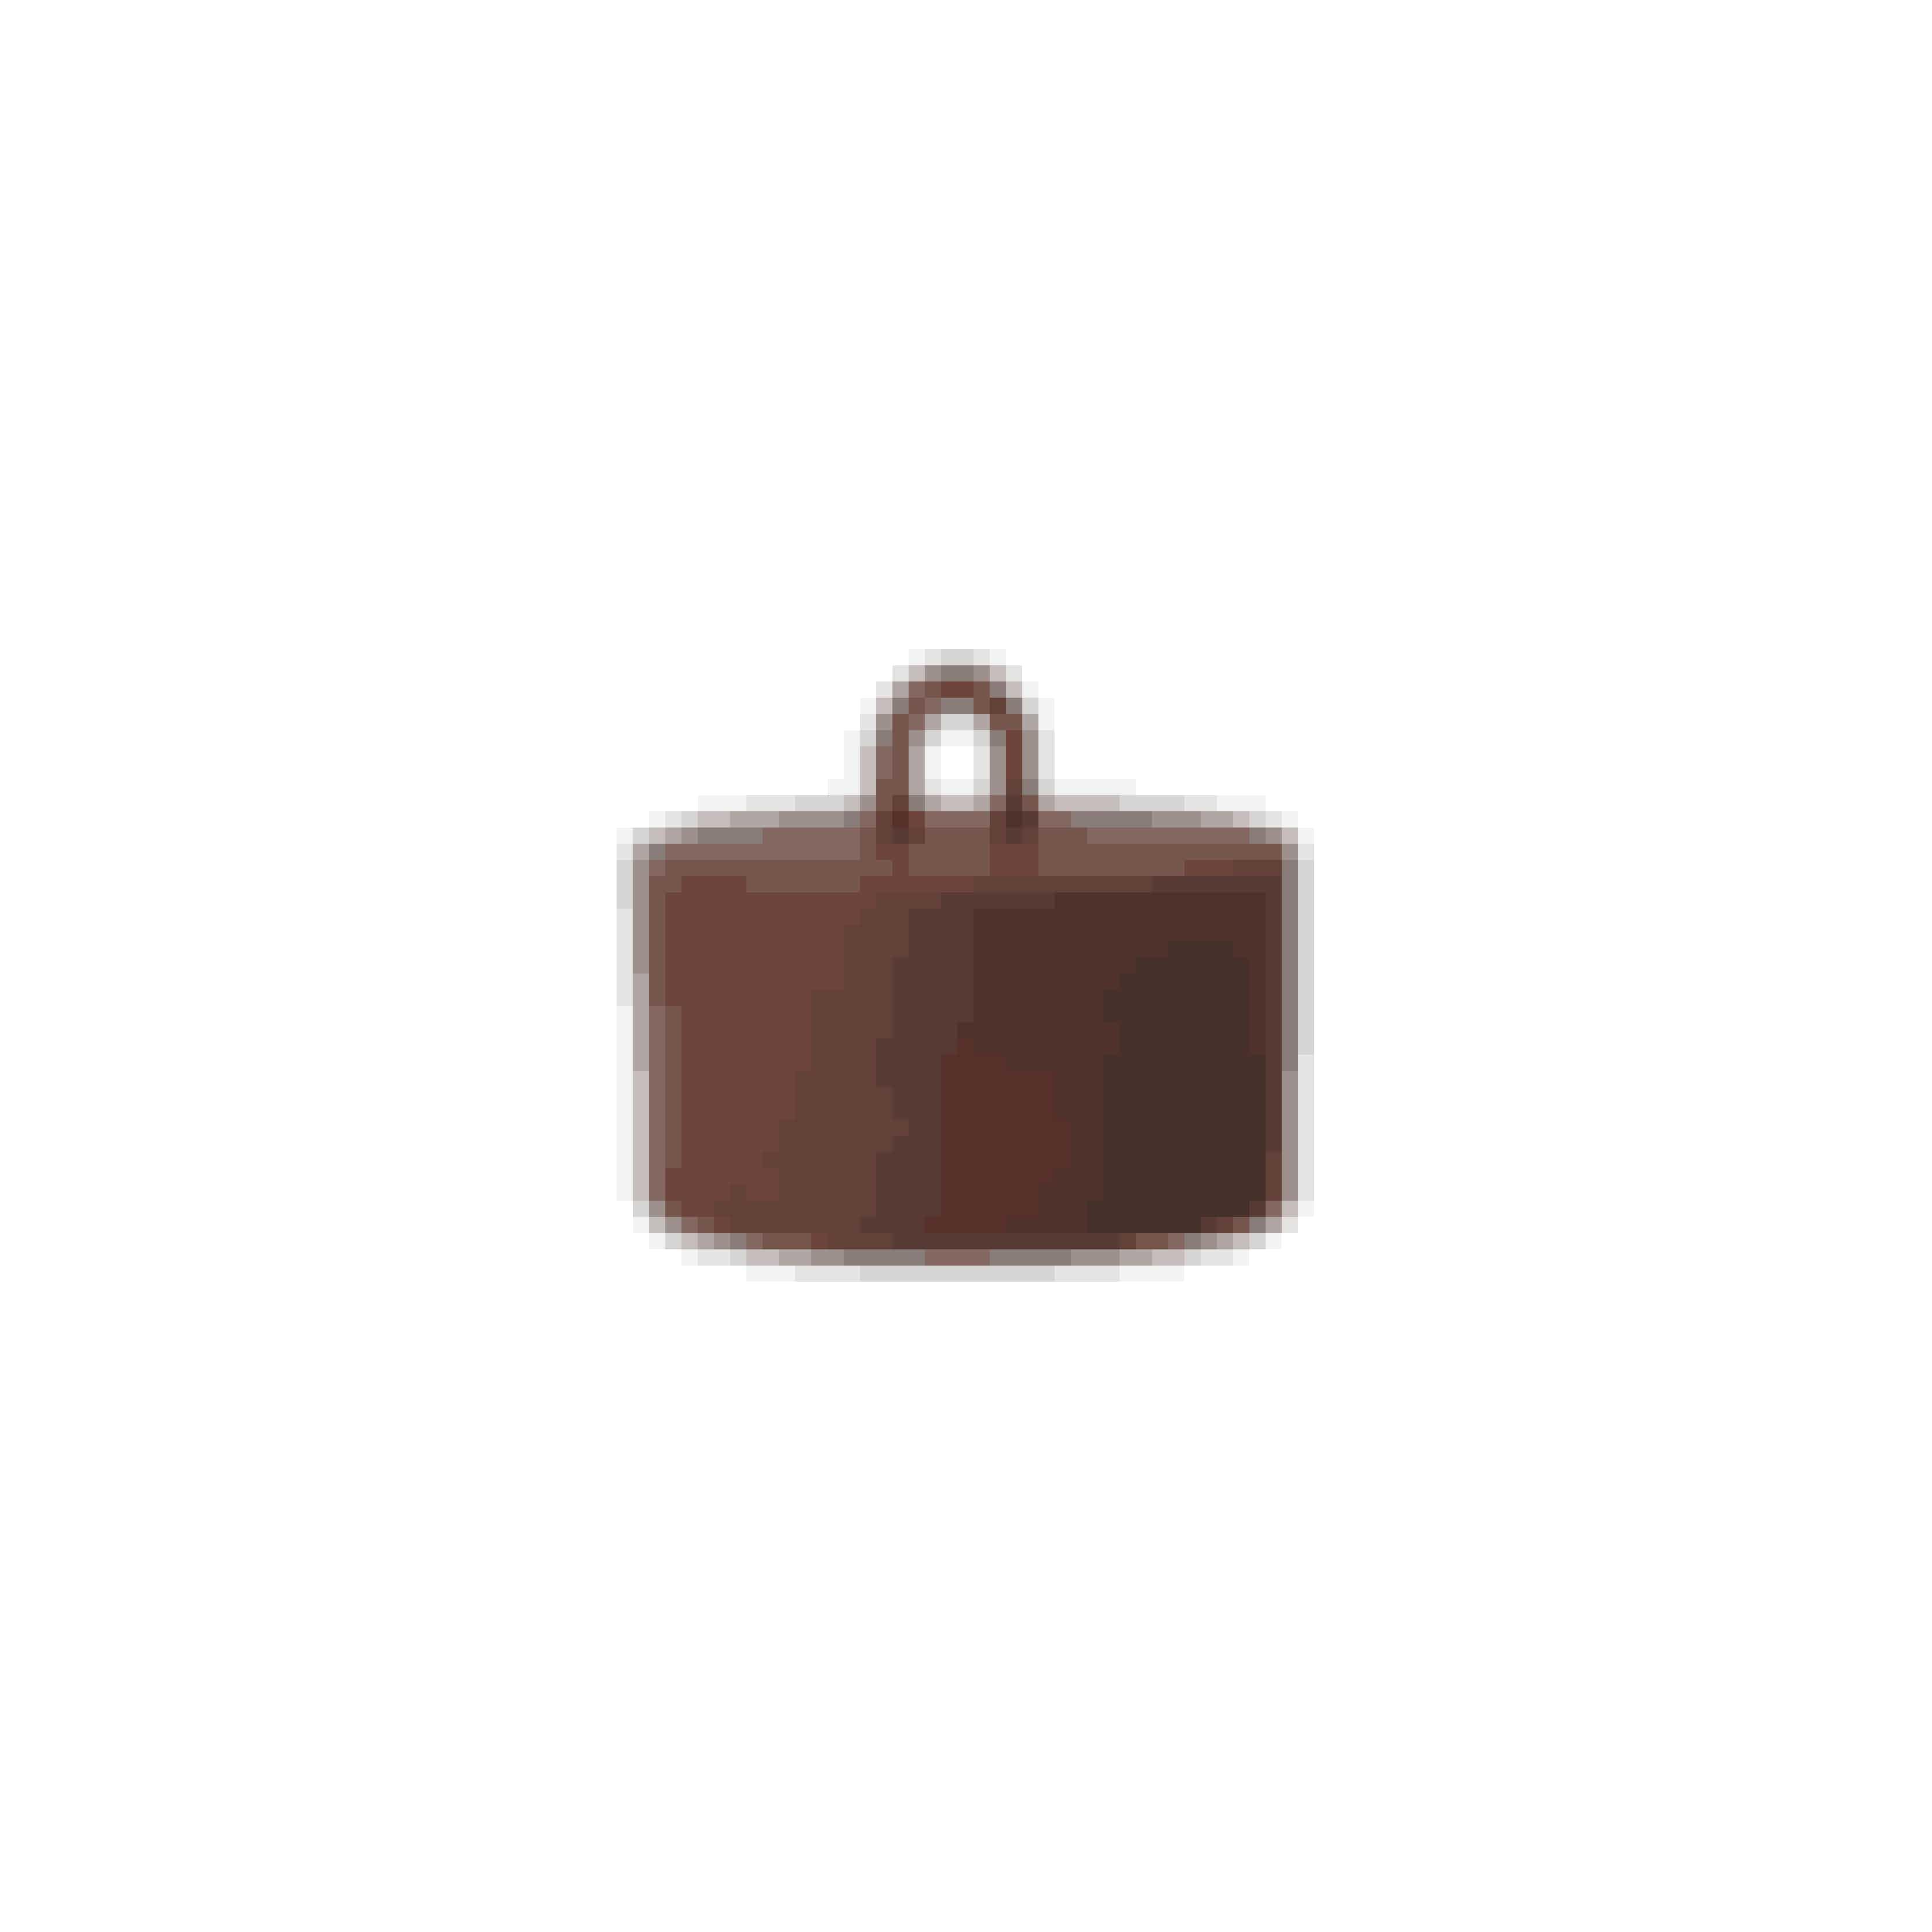 Lågkrukke i støbejern, diam. 9,5 cm, 250 kr. Ferm Living hos luxoliving.dk